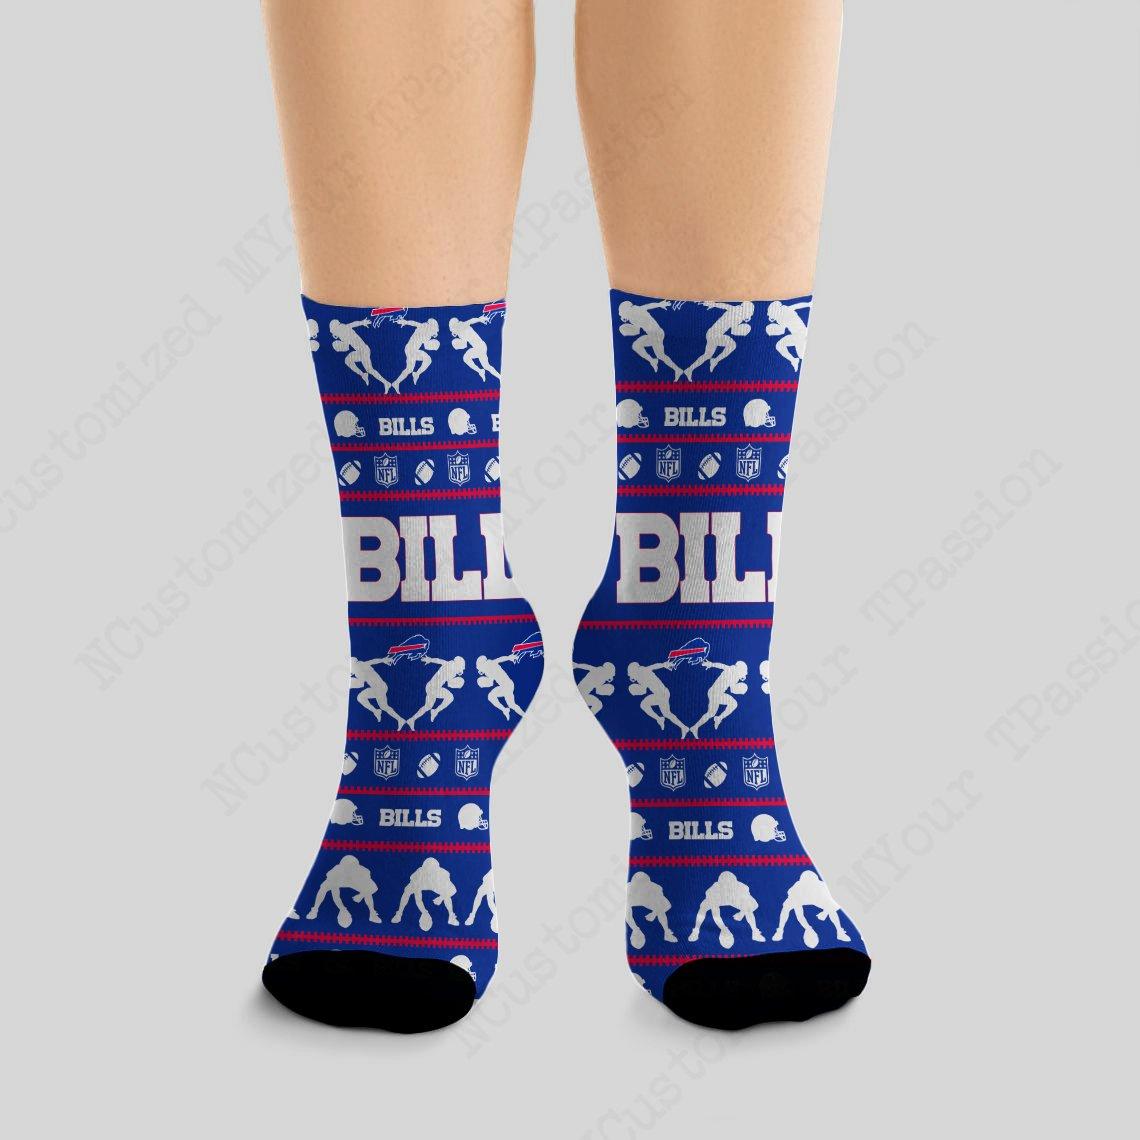 Buffalo Bills Socks Matching Clothes, Buffalo Bills Socks